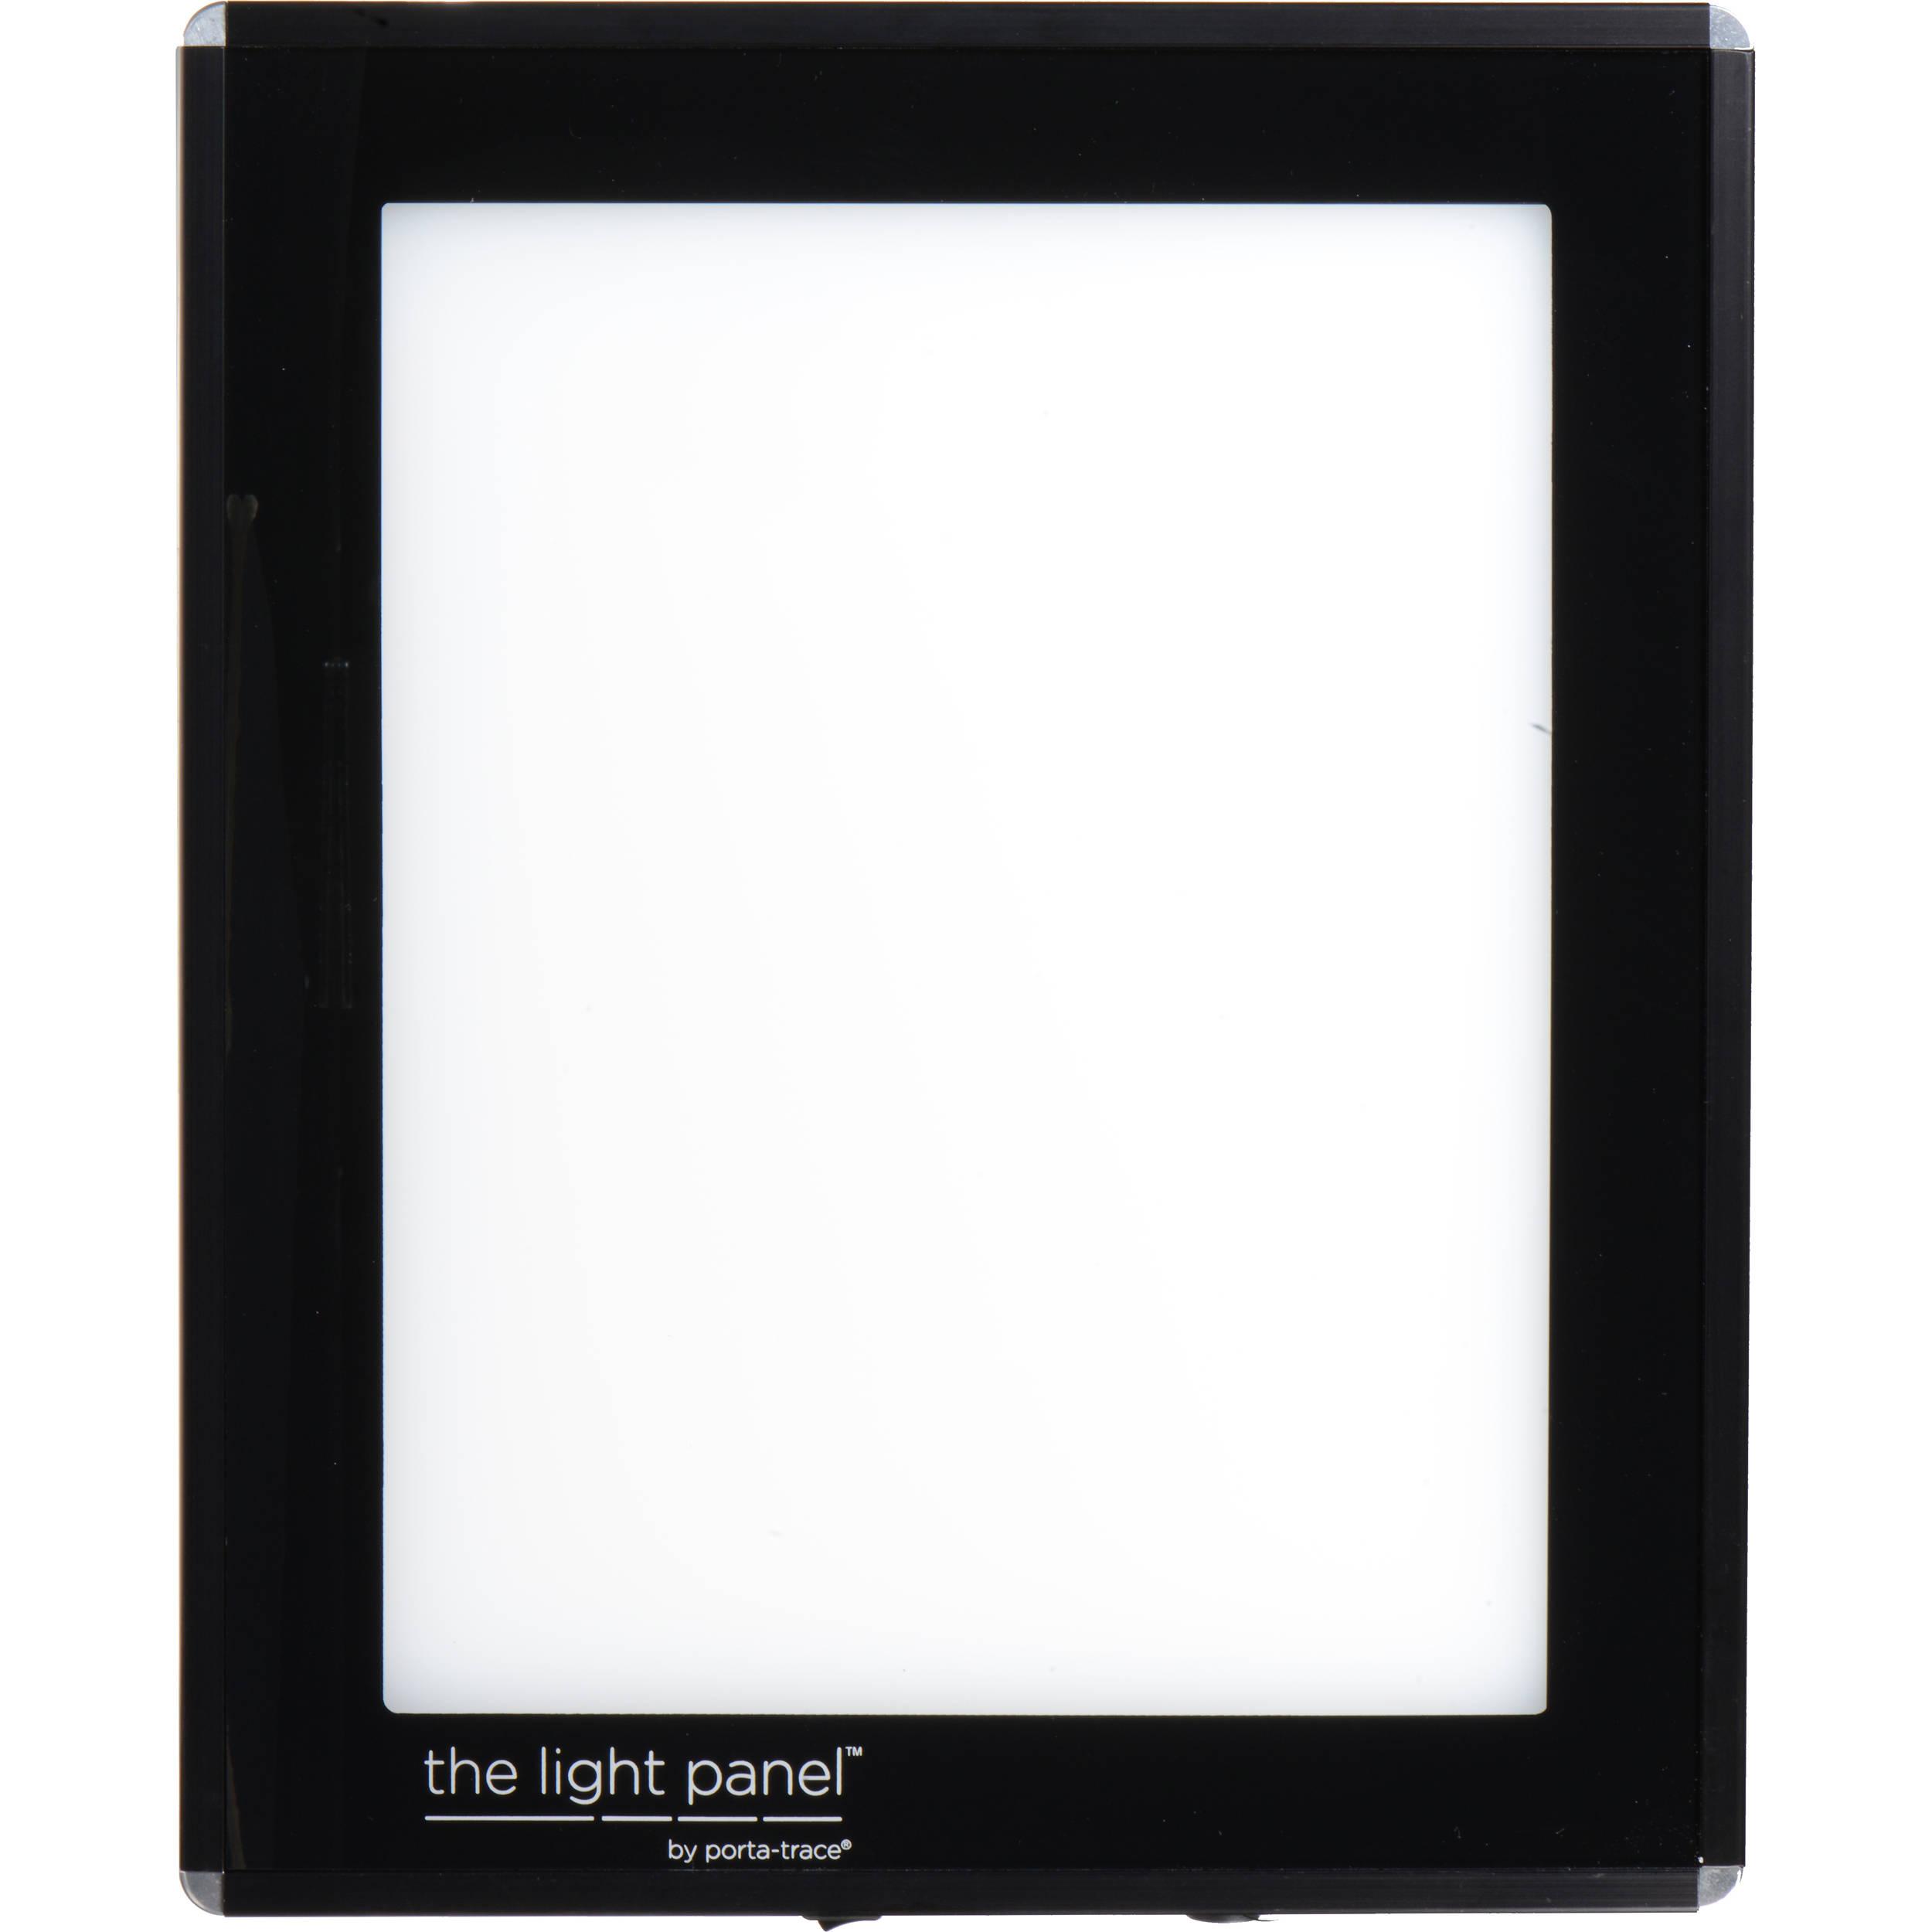 Light panel photo